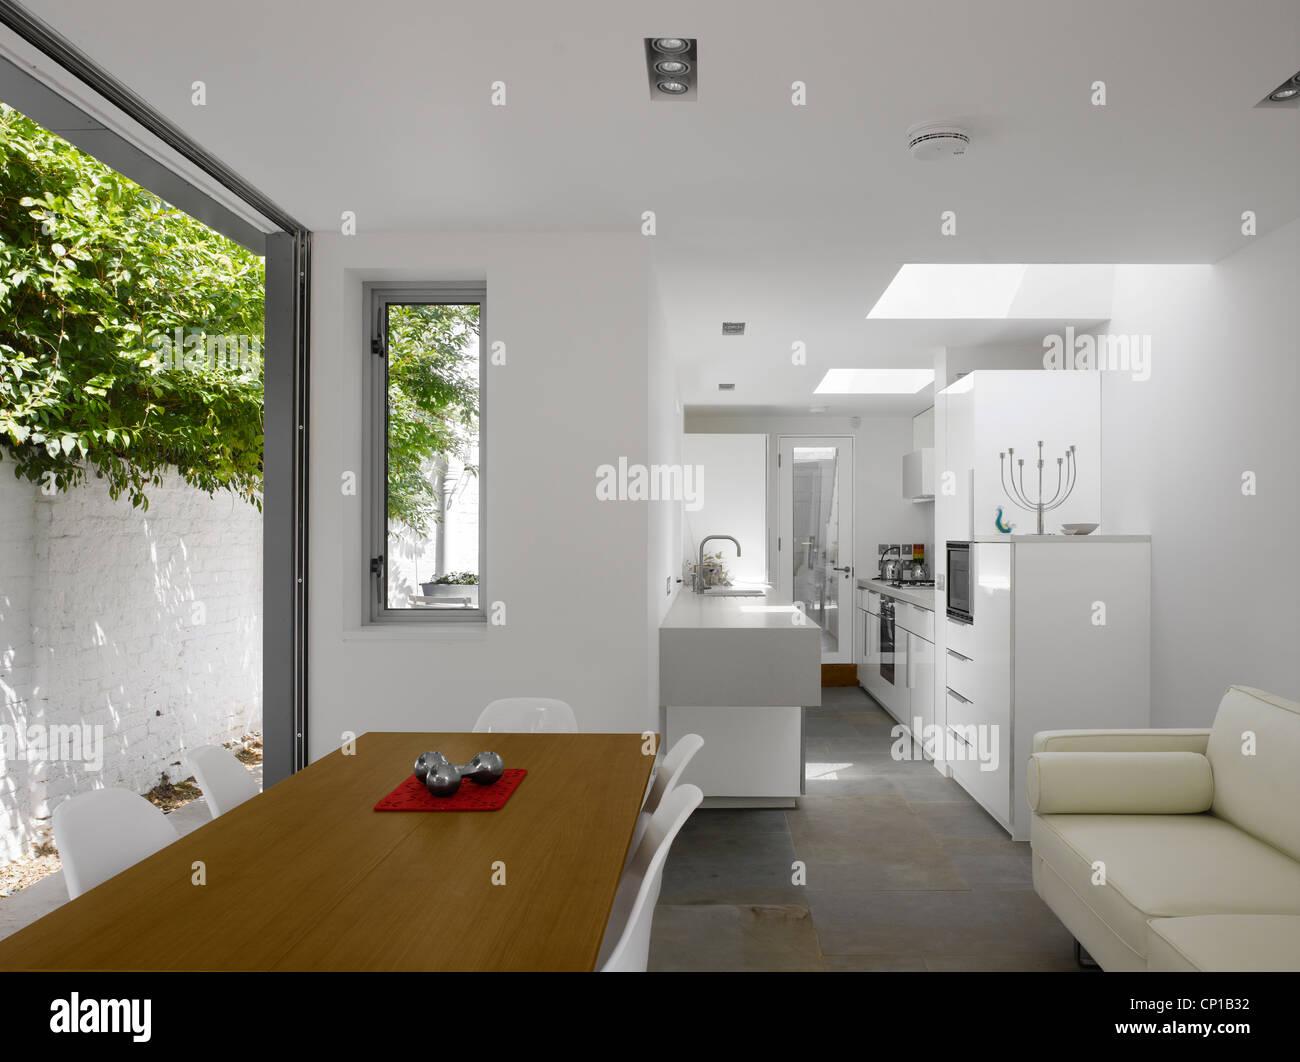 Cocina abierta extensión por Paul Archer Diseño, Londres, Reino ...